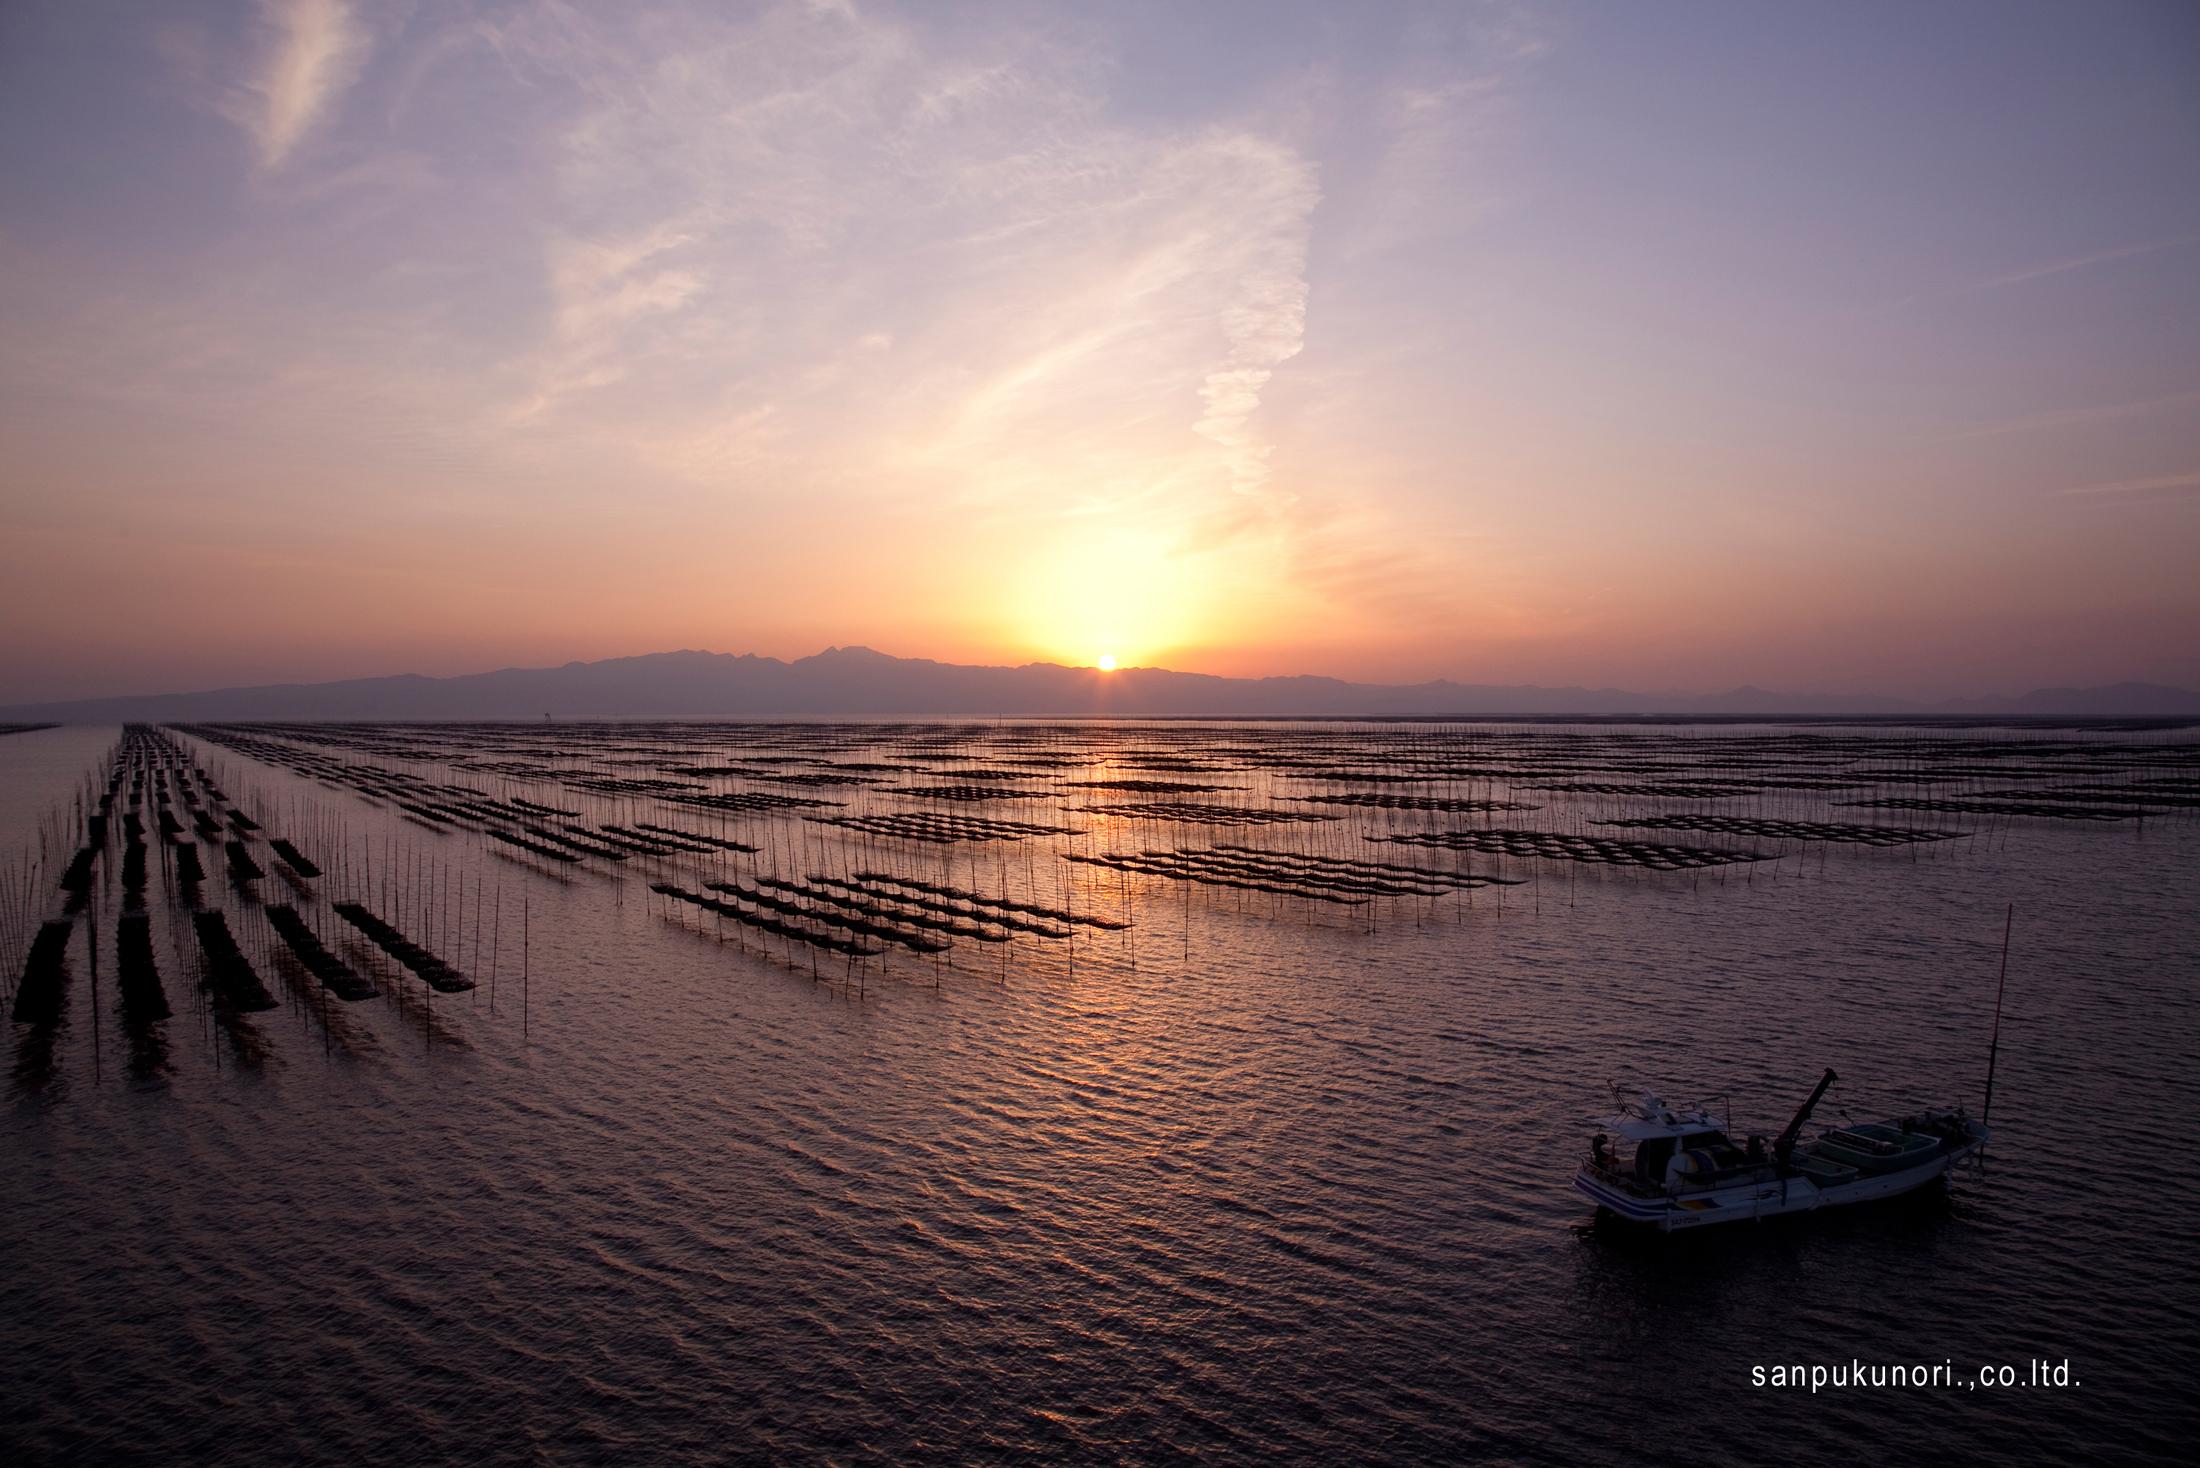 Premium nori from Japan's Ariake Sea